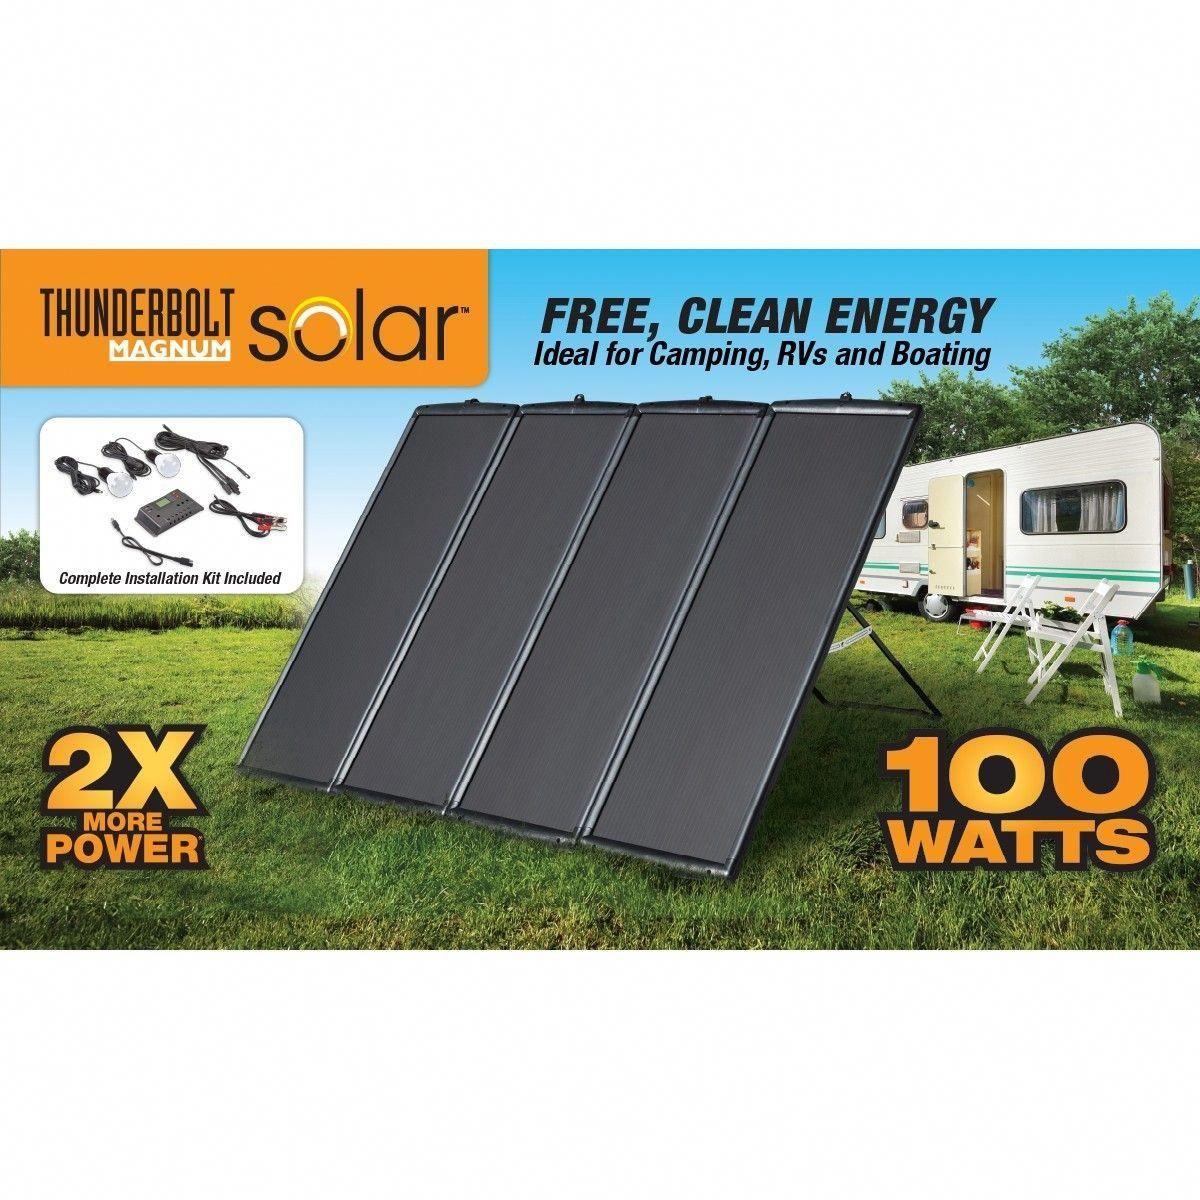 100 Watt Solar Panel Kit In 2020 Best Solar Panels Solar Heating Solar